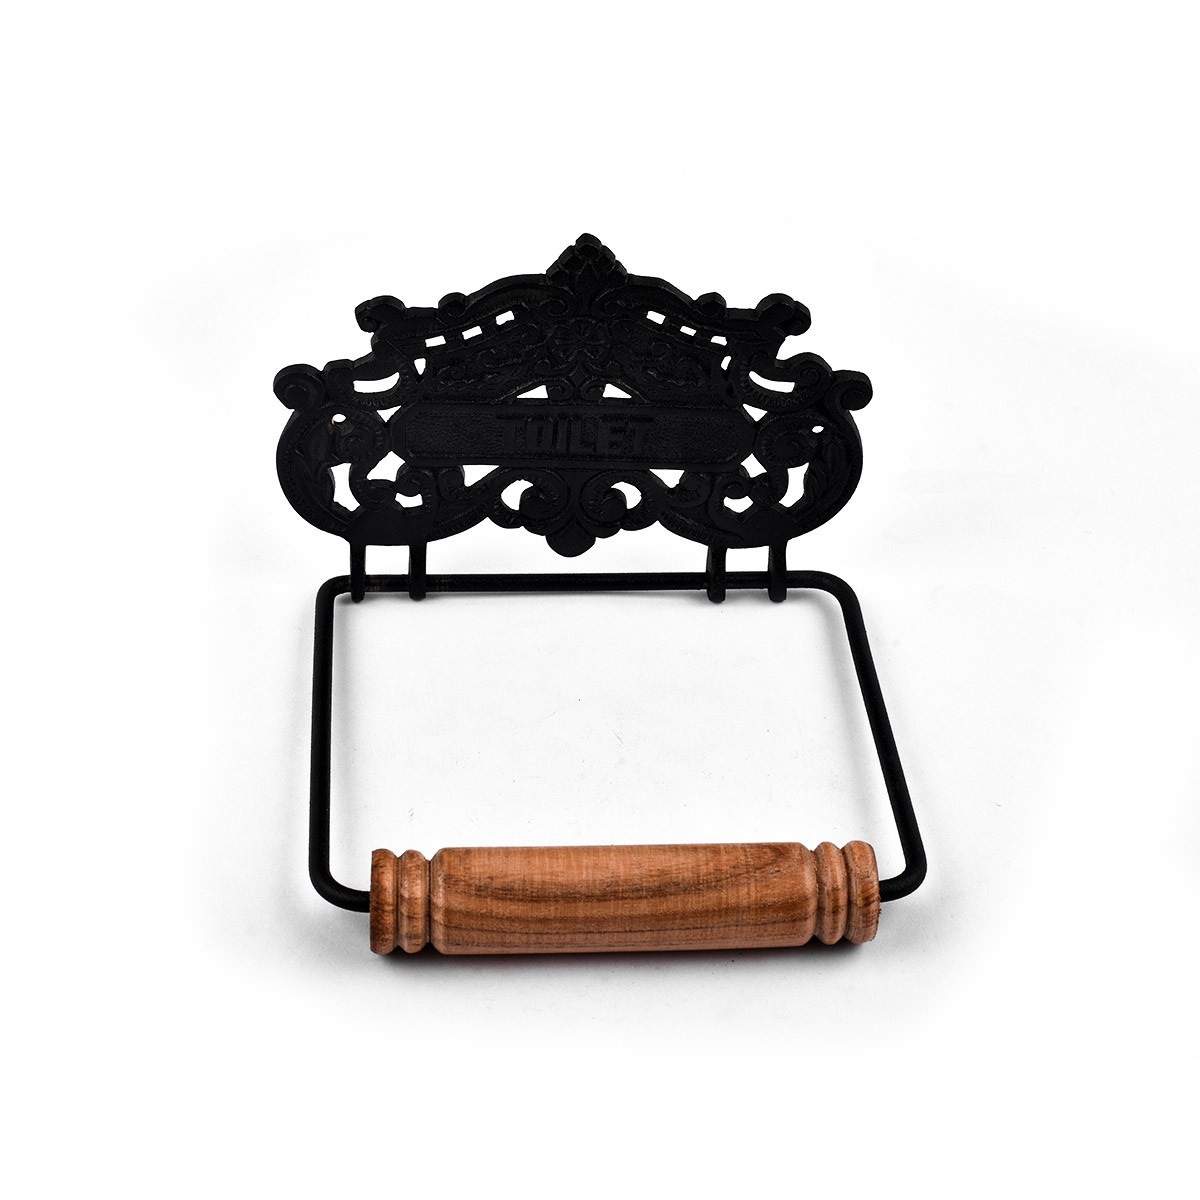 Princess Crown Toilet Tissue Holder Black Aluminum Black Toilet Paper Holder Brass Toilet Paper Holder Tissue Holder For Bathroom